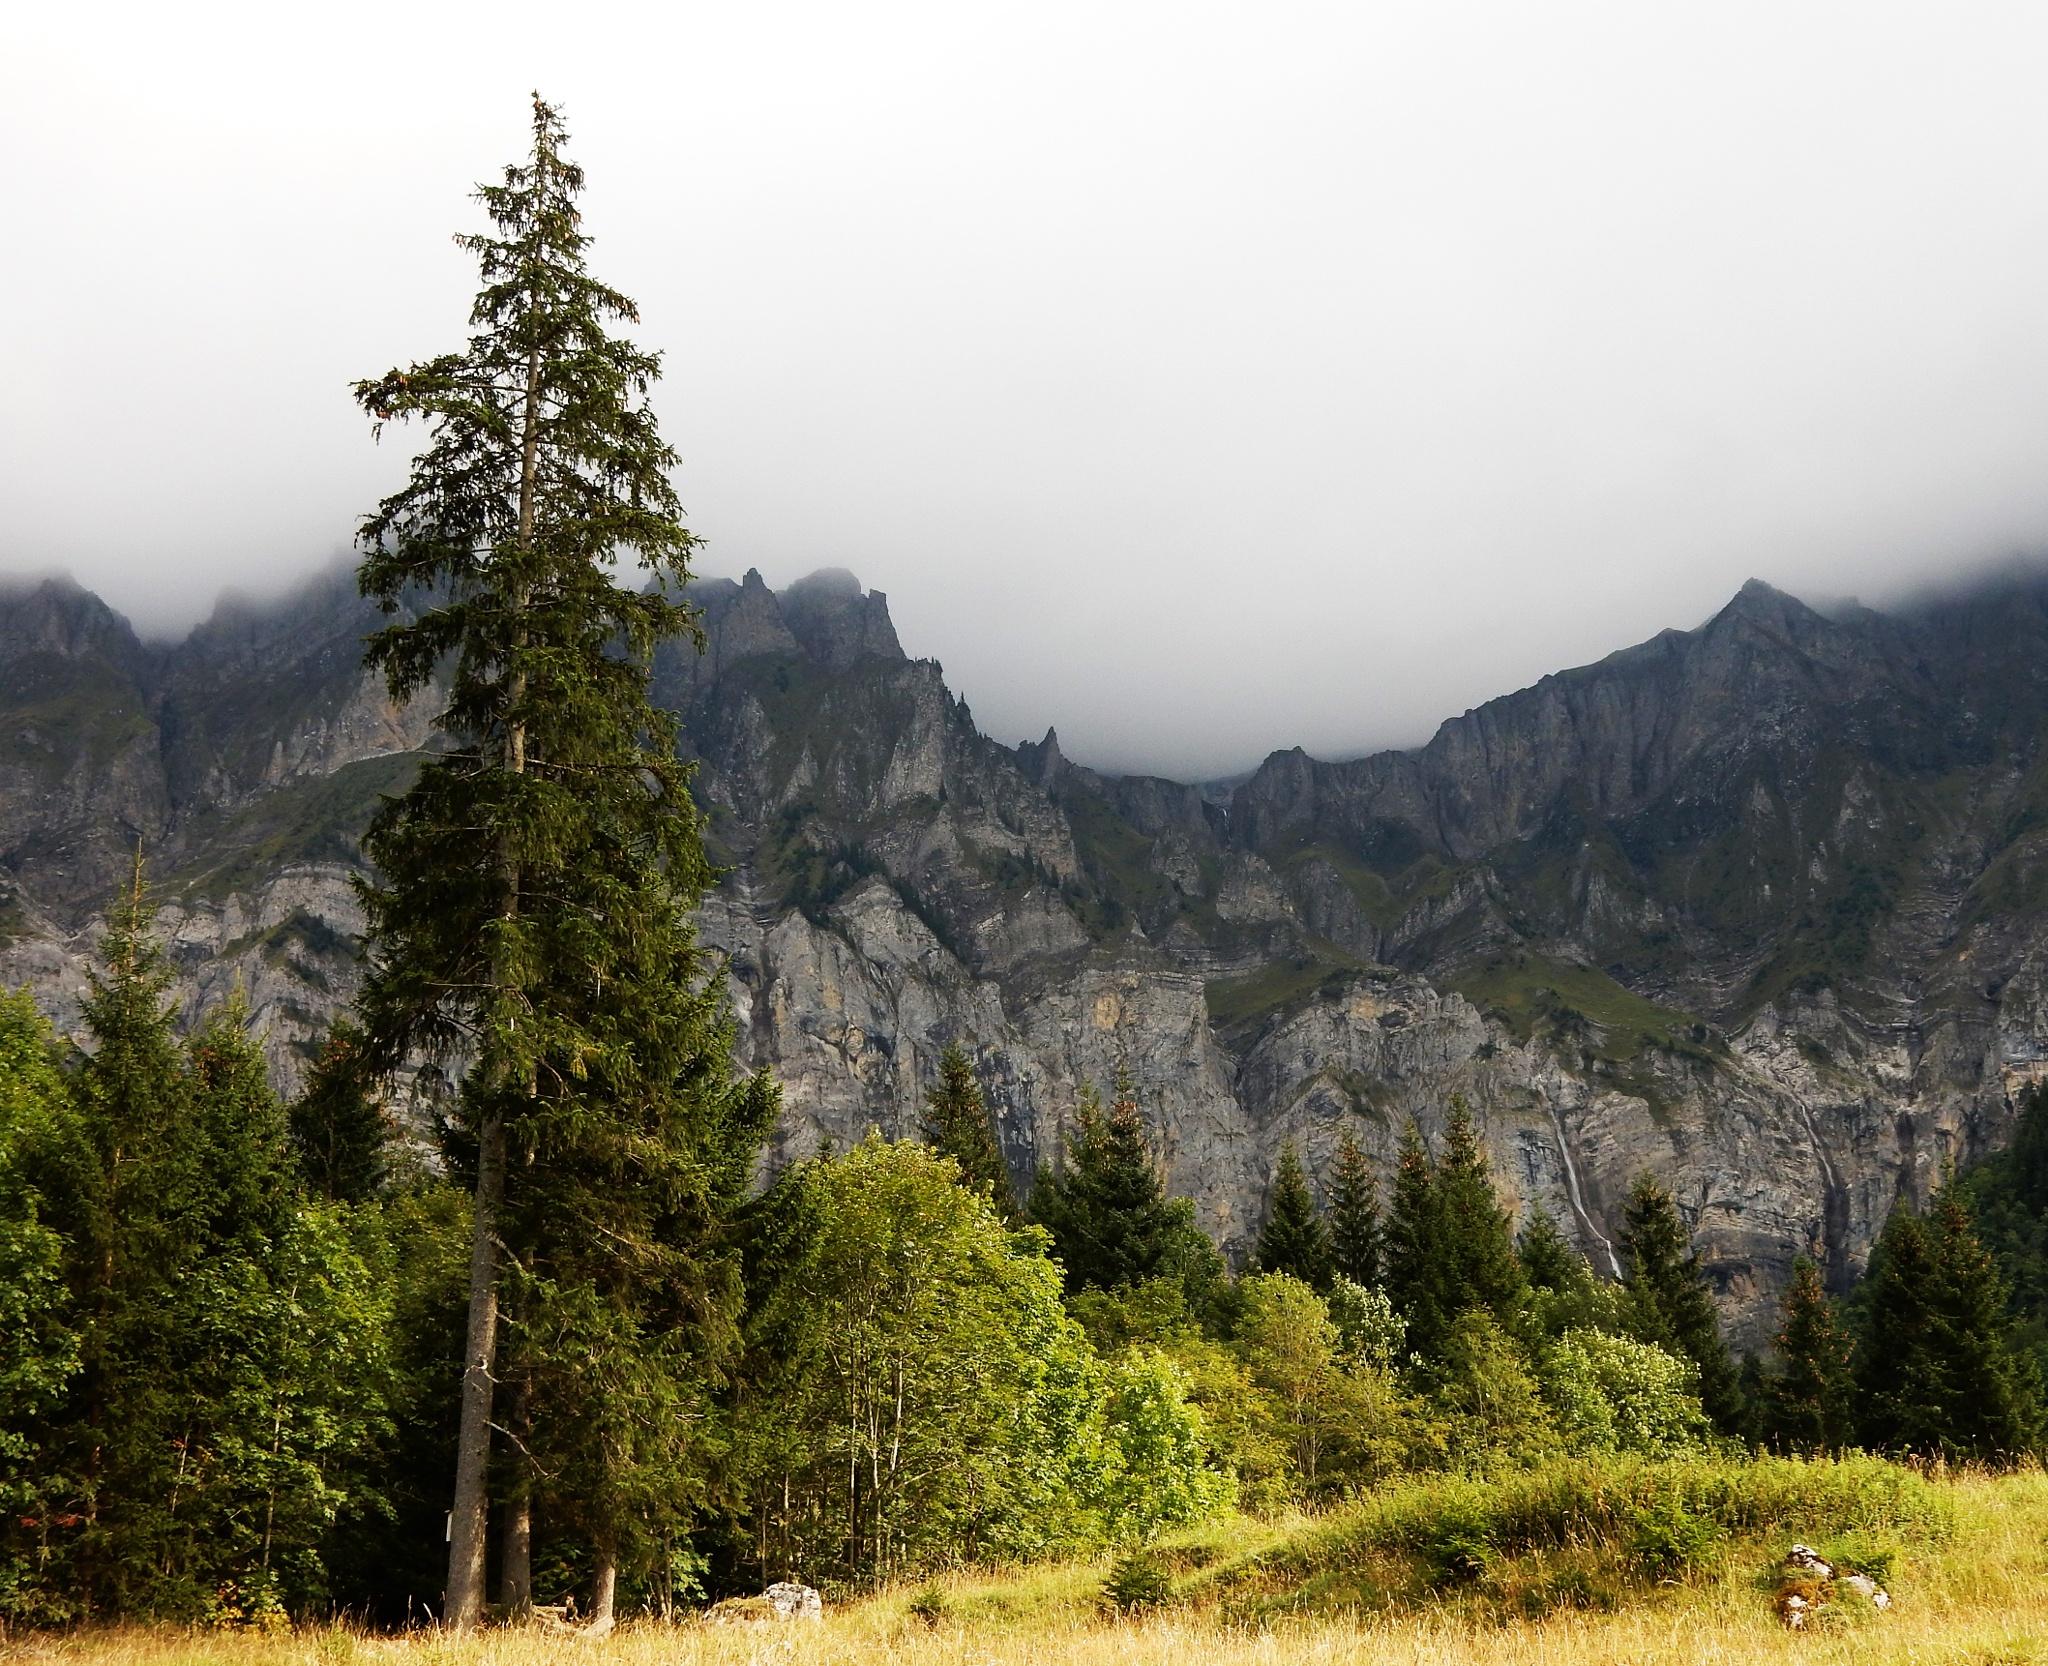 Big Tree by silvio.zurbrugg